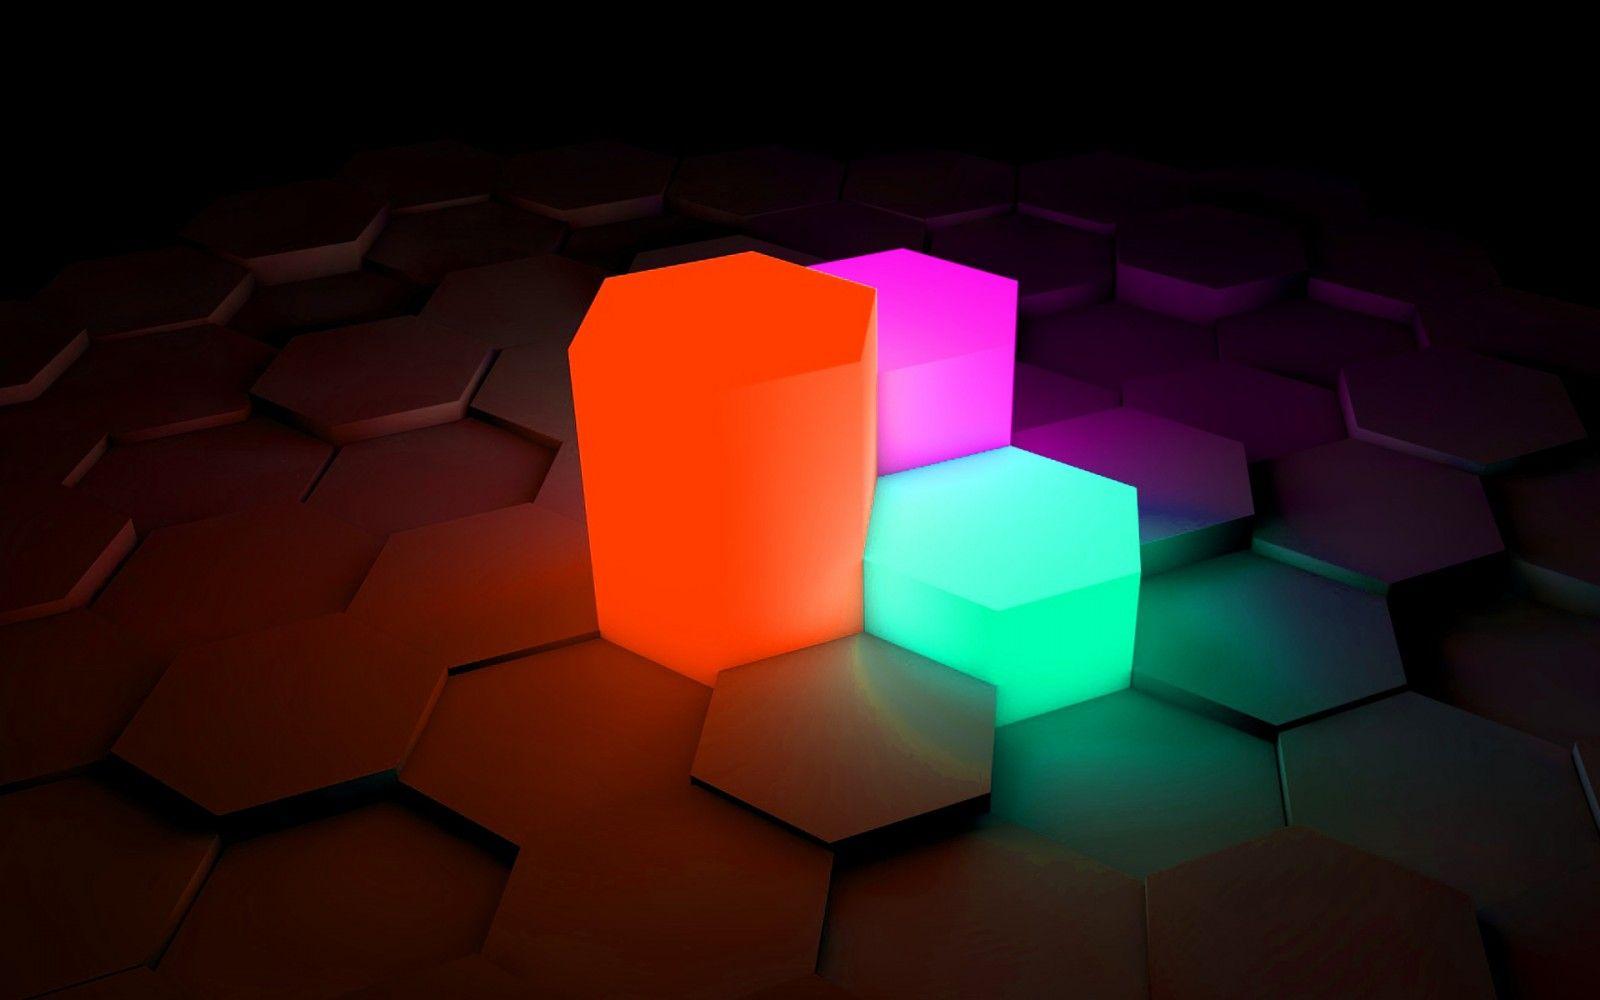 neon light full hd 3d wallpapers hd wallpaper